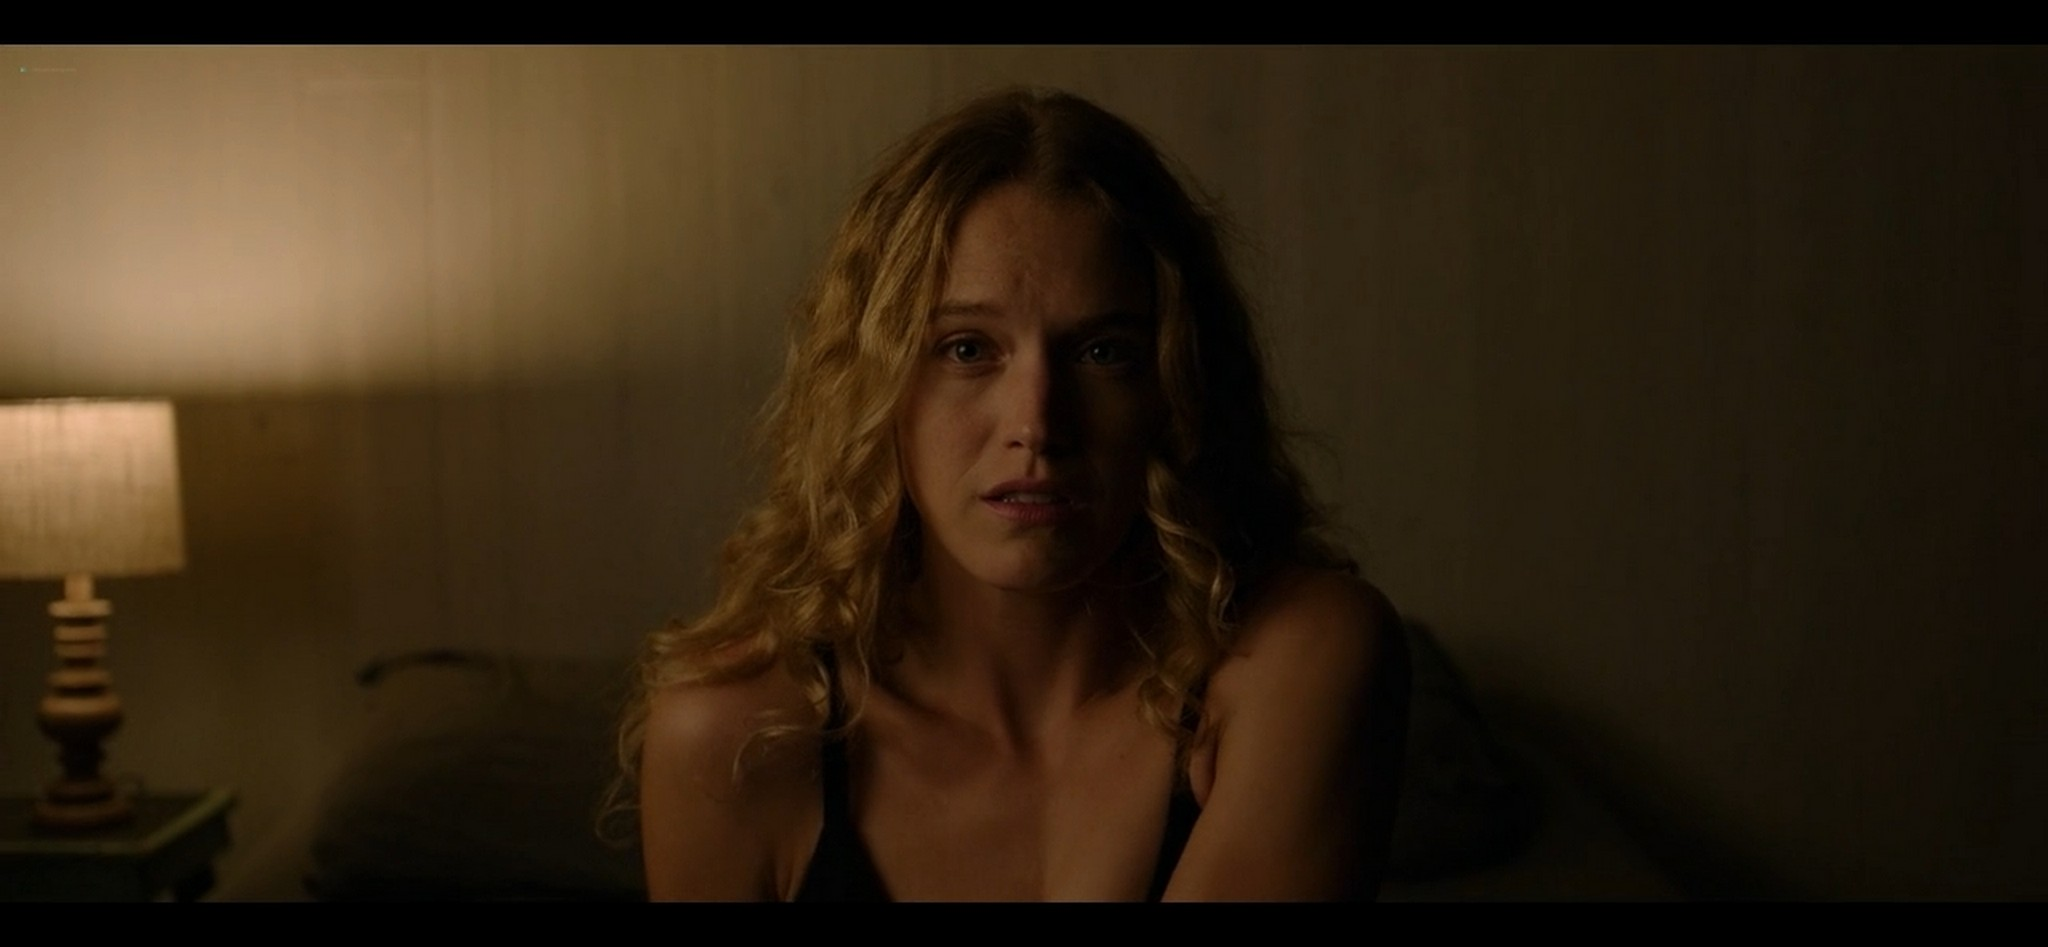 Dana Drori nude topless and sex Into the Dark Tentacles s2e11 720p 6